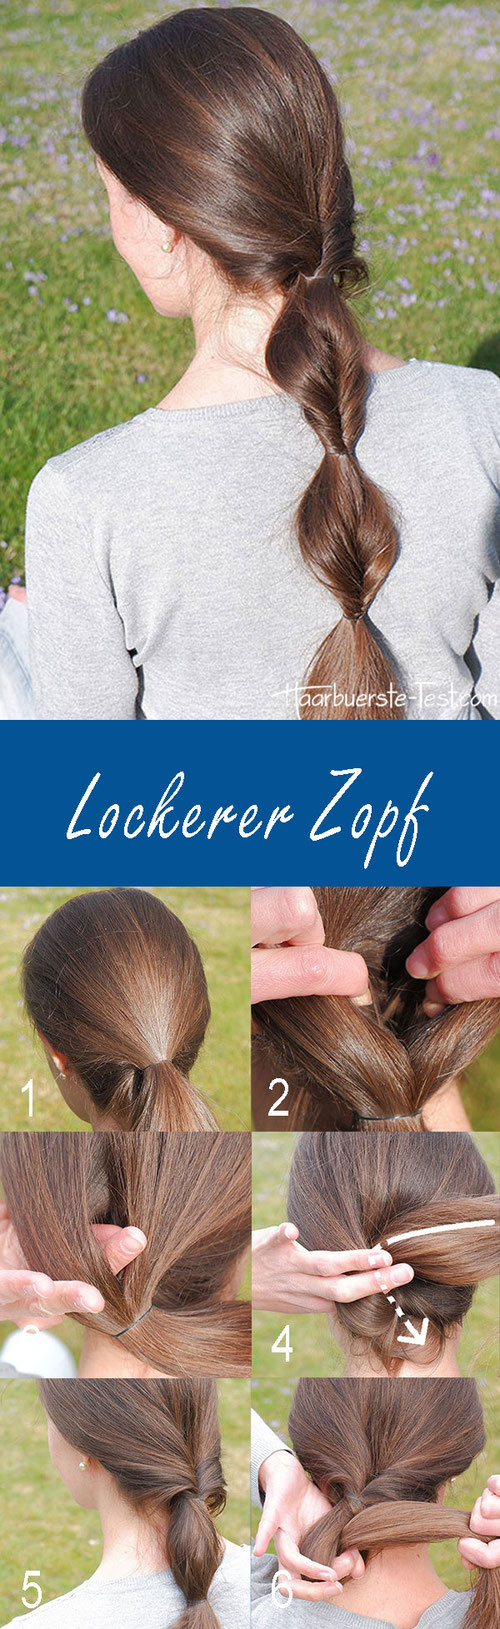 Zopf lange Haare, Zopf lange Haare einfach, lange Haare Zopf